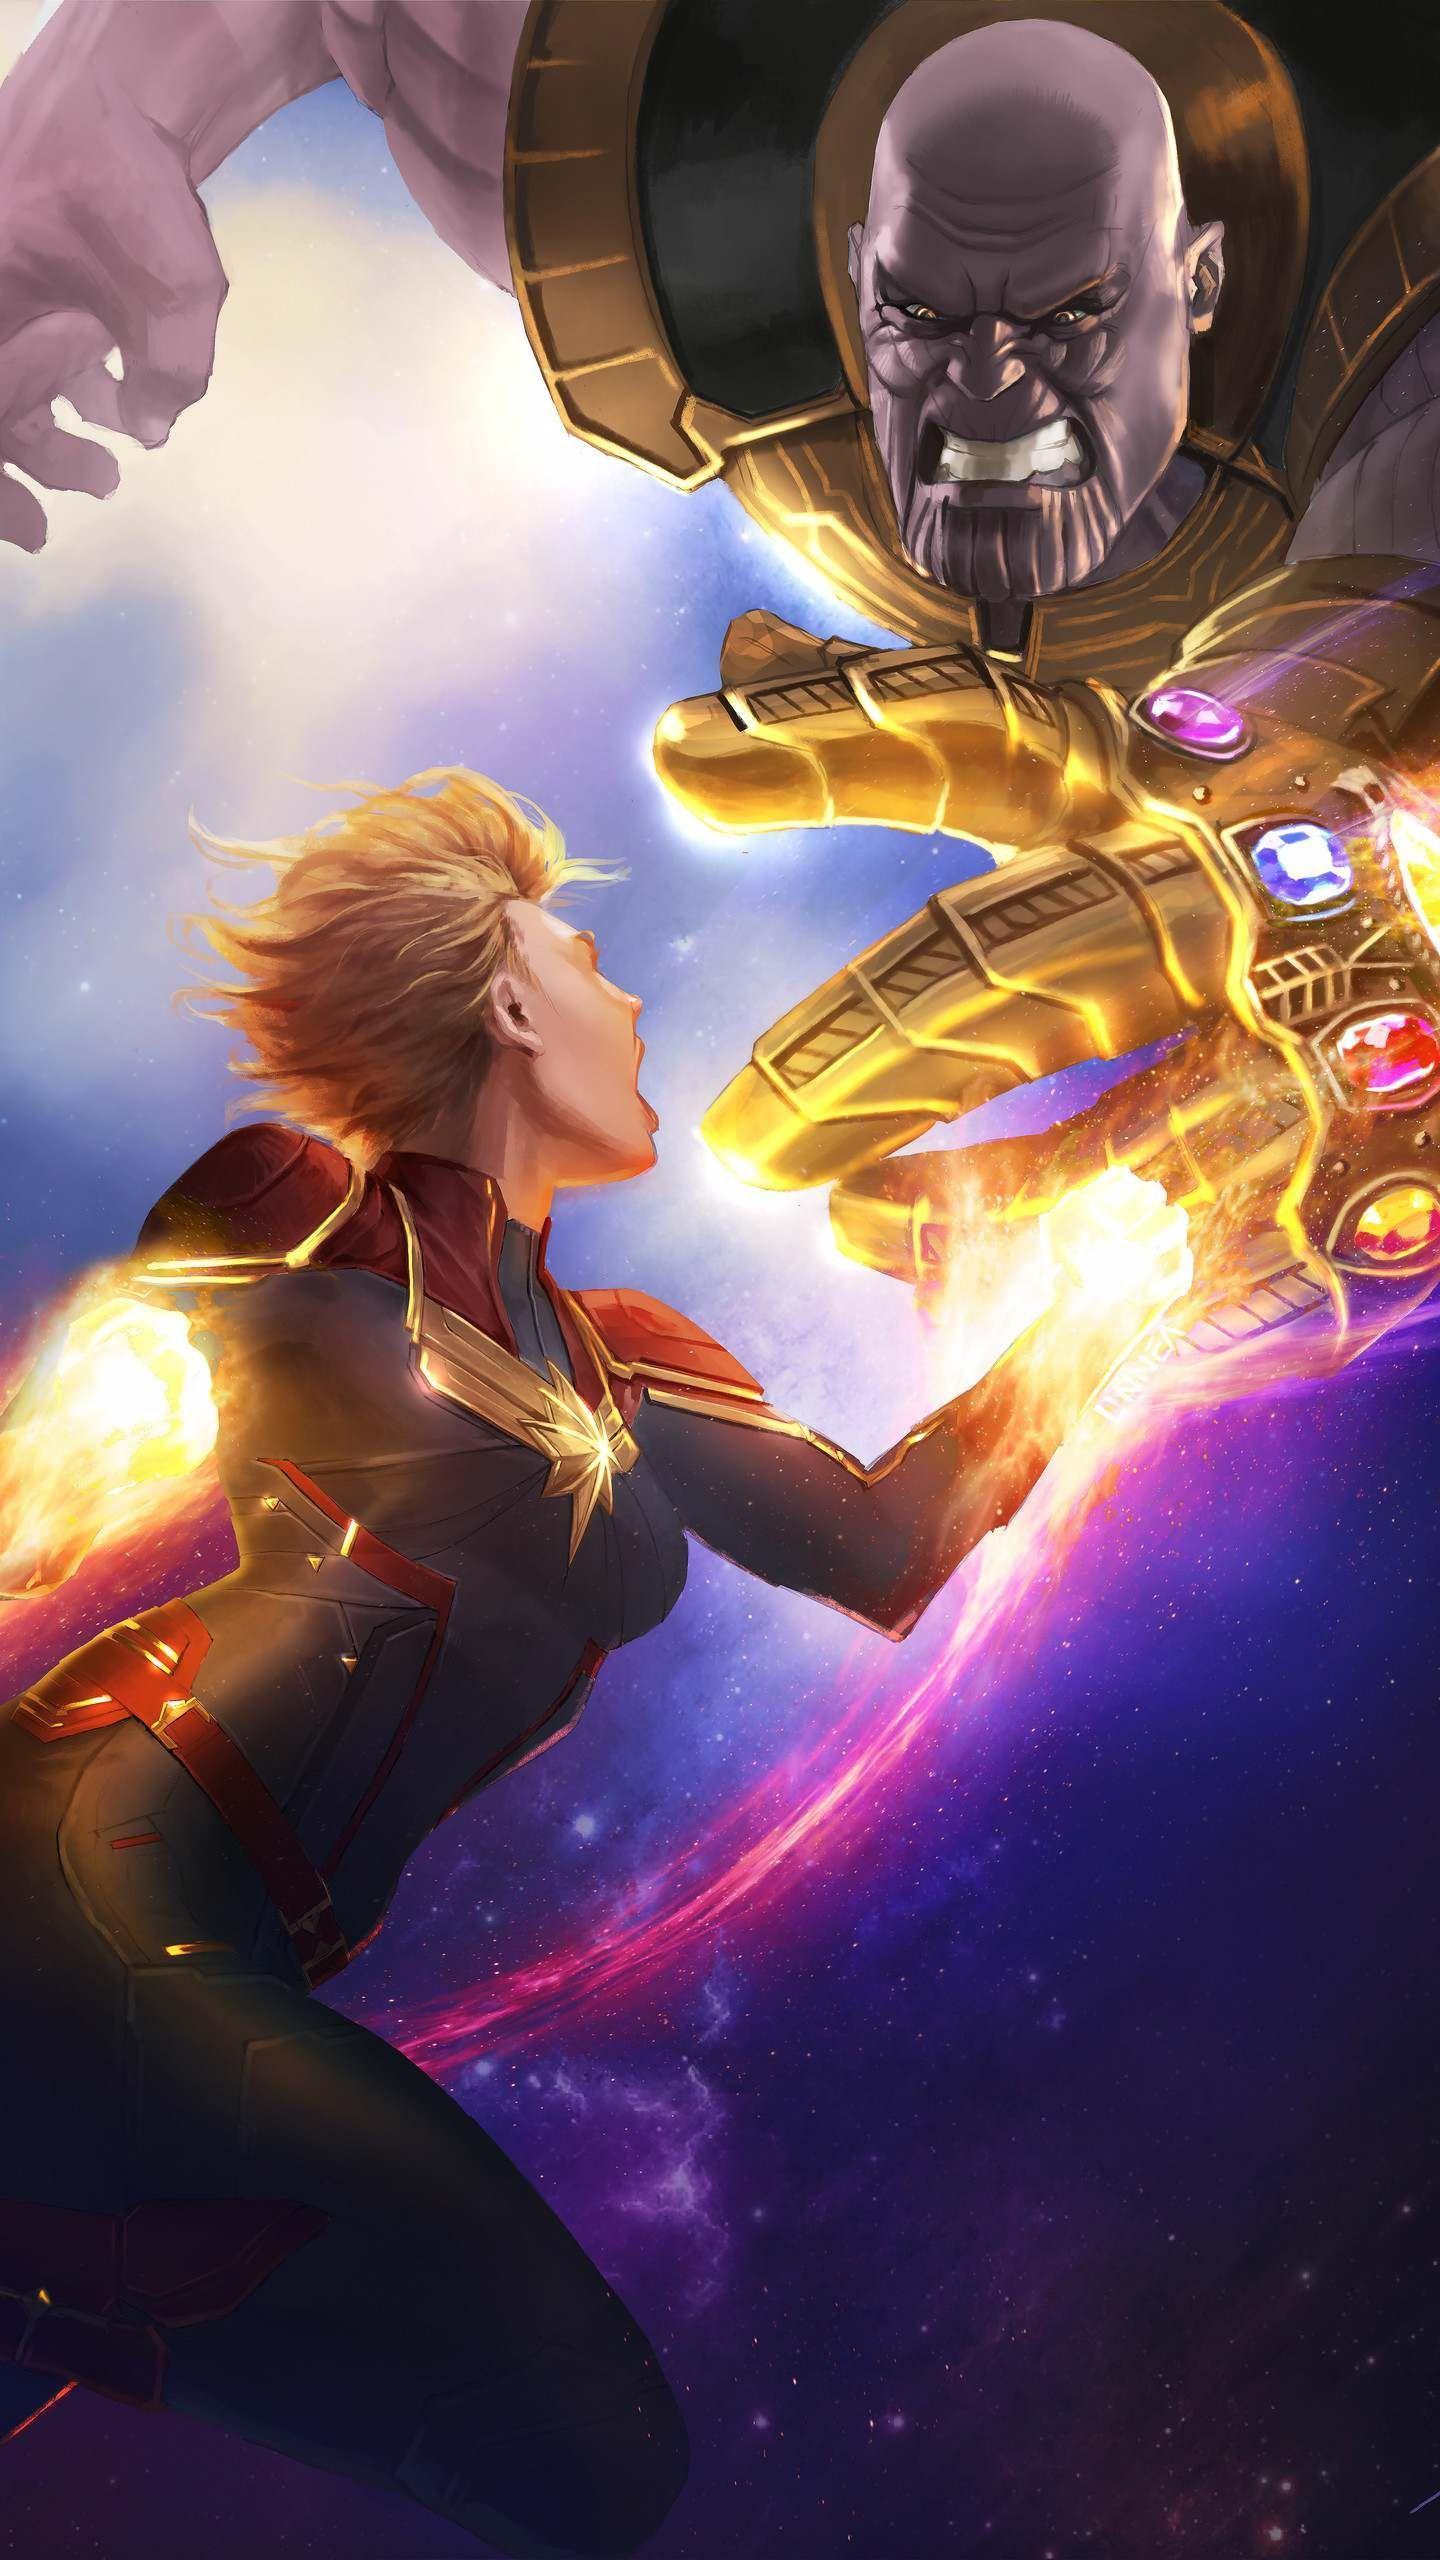 Avengers Endgame Superheroes Wallpapers HD 2019 for ...